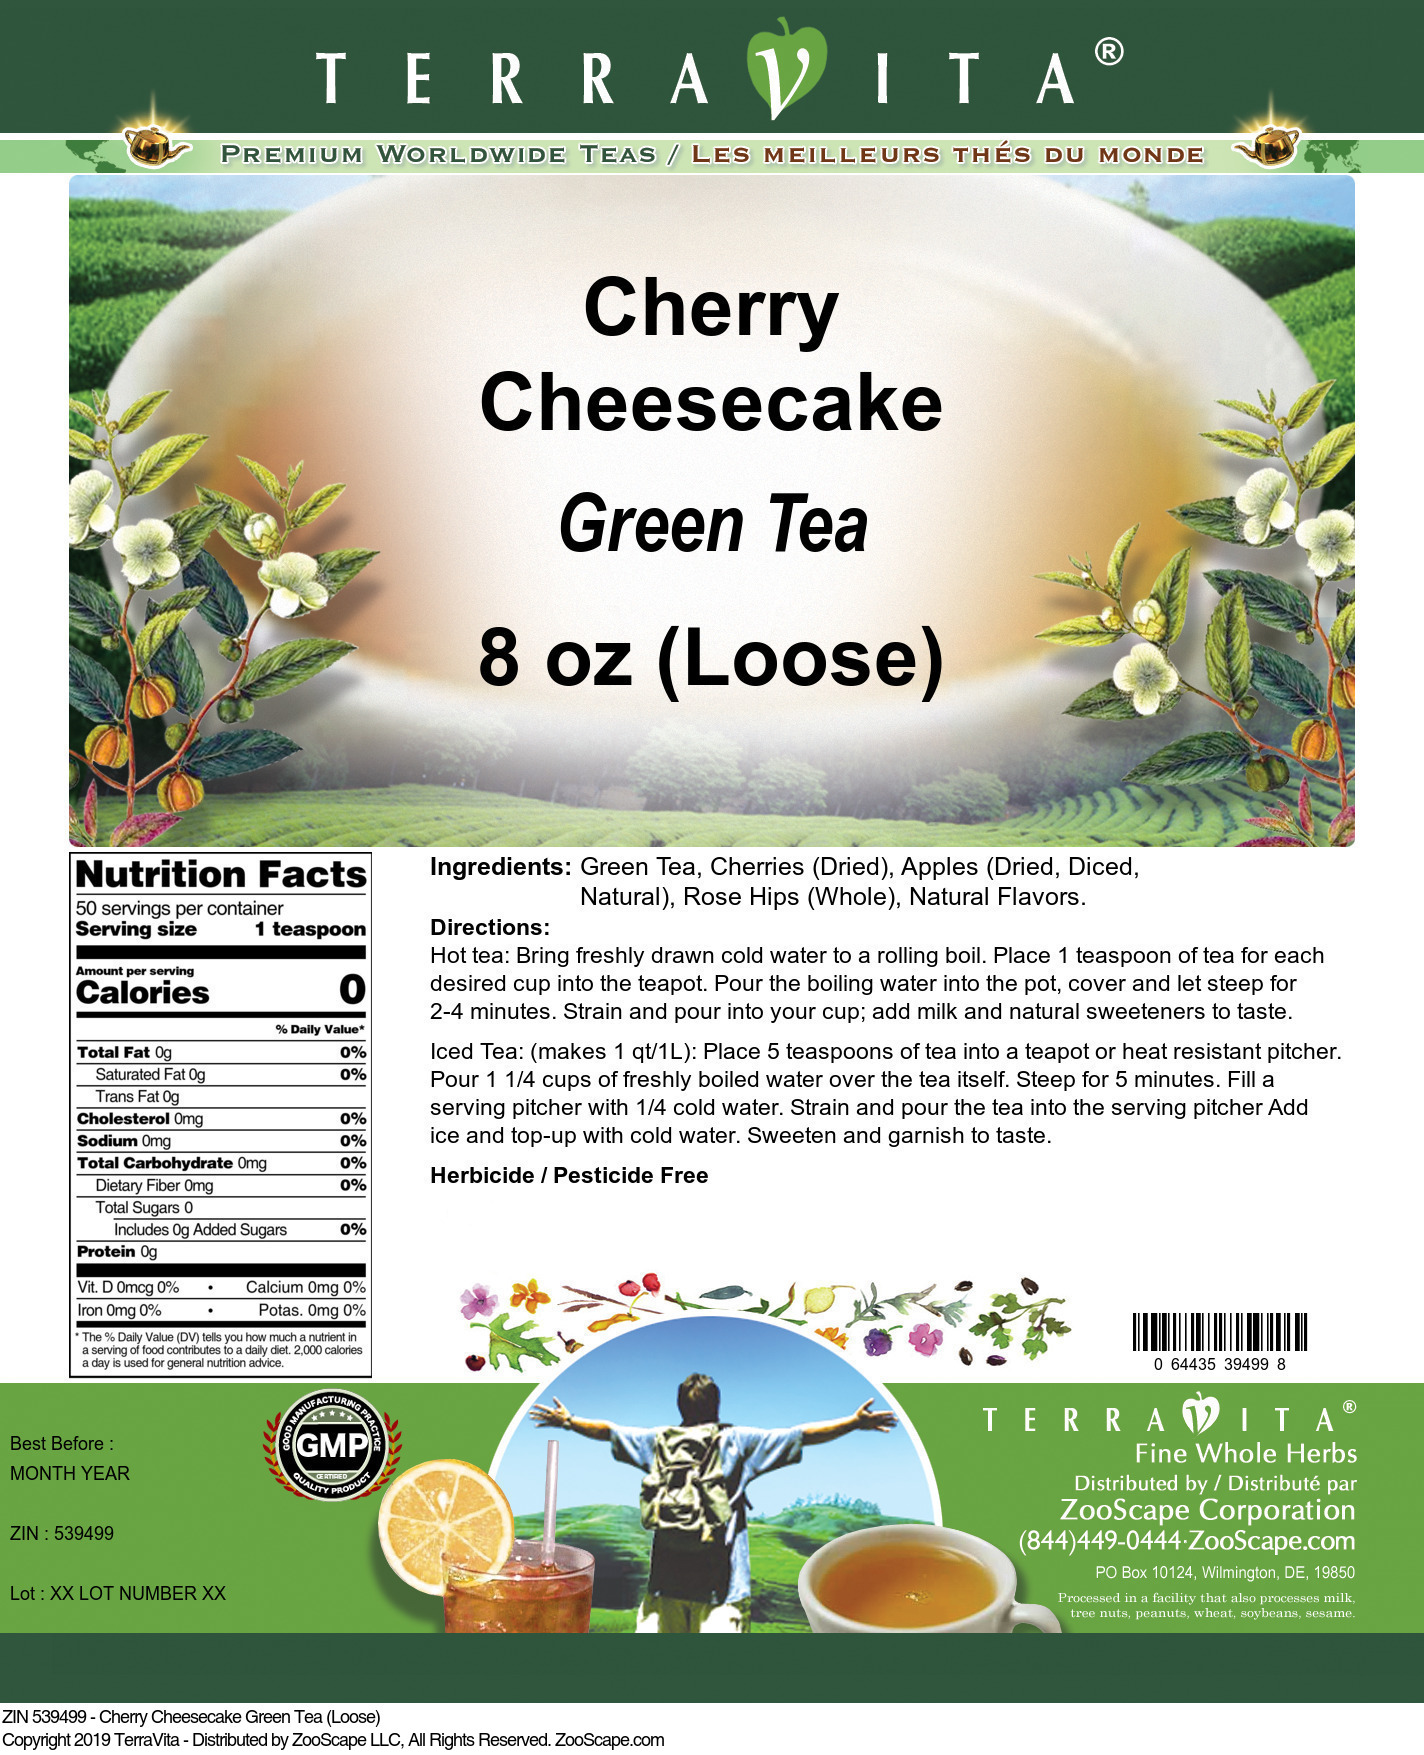 Cherry Cheesecake Green Tea